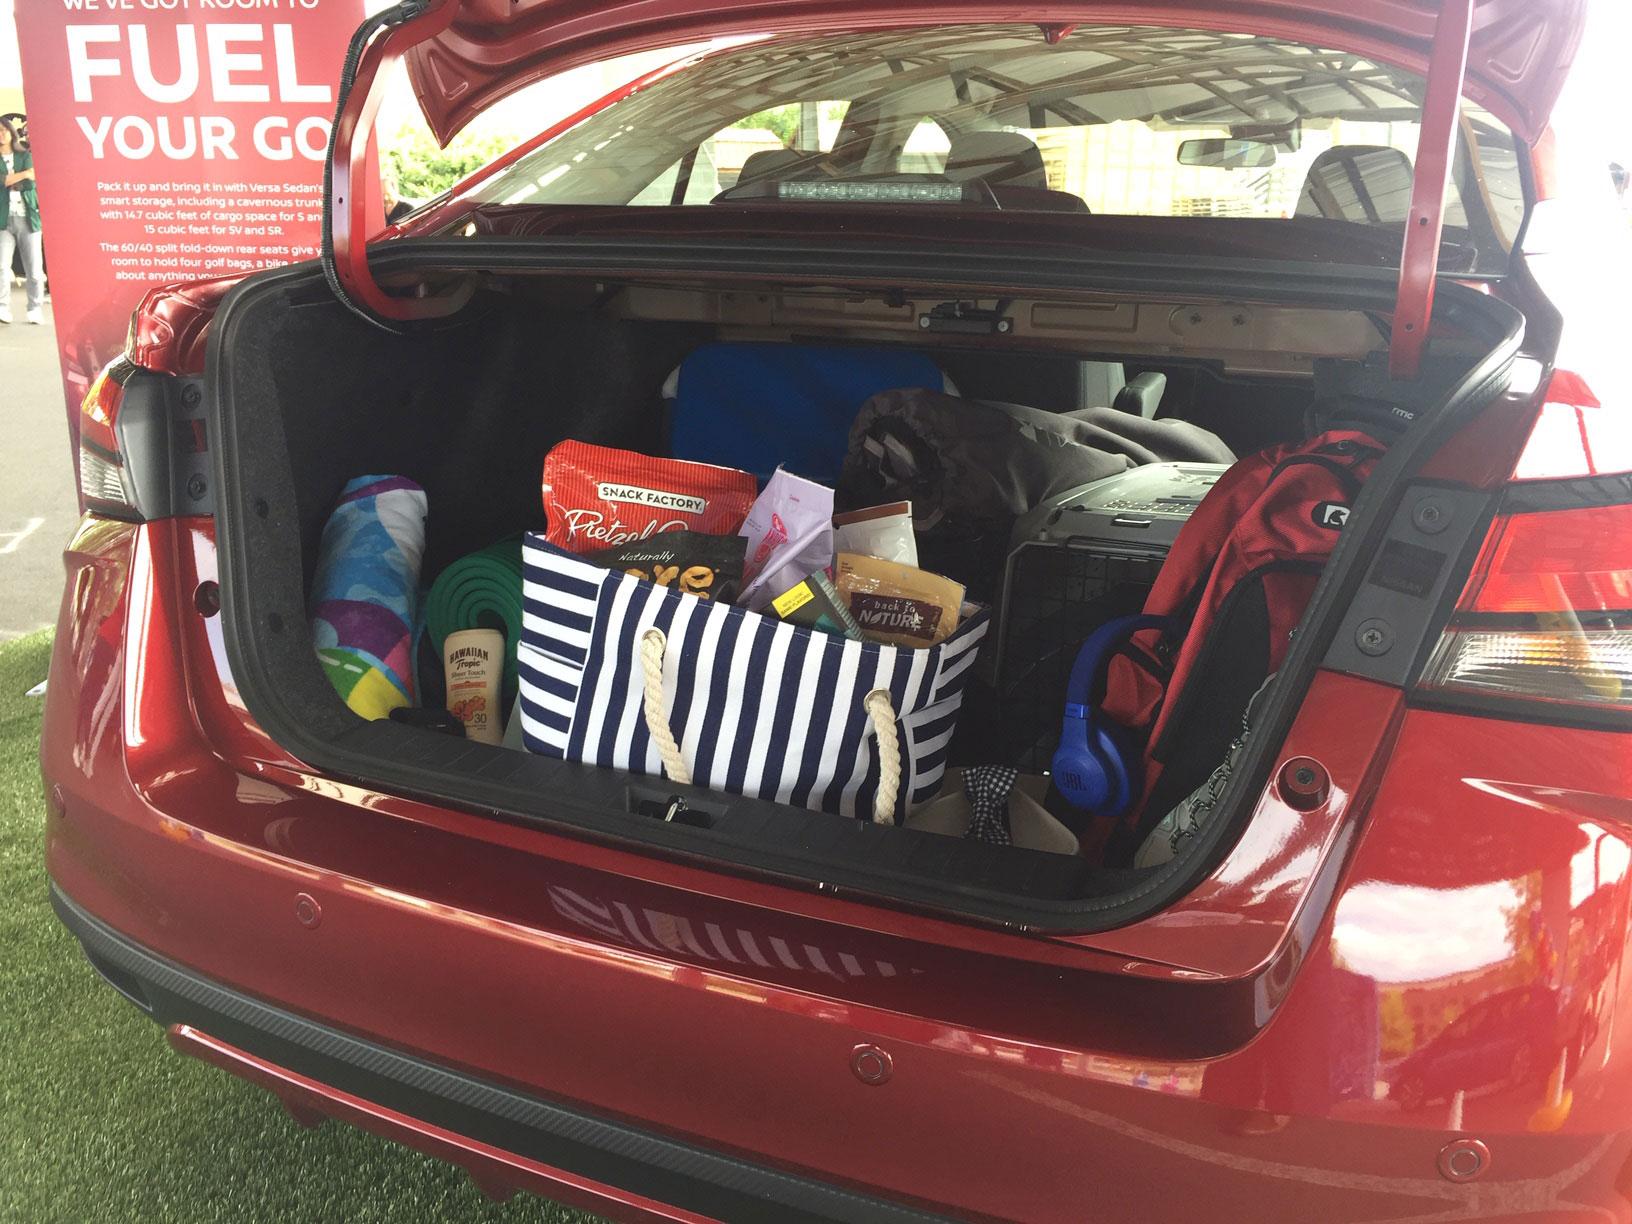 2020 Nissan Versa trunk